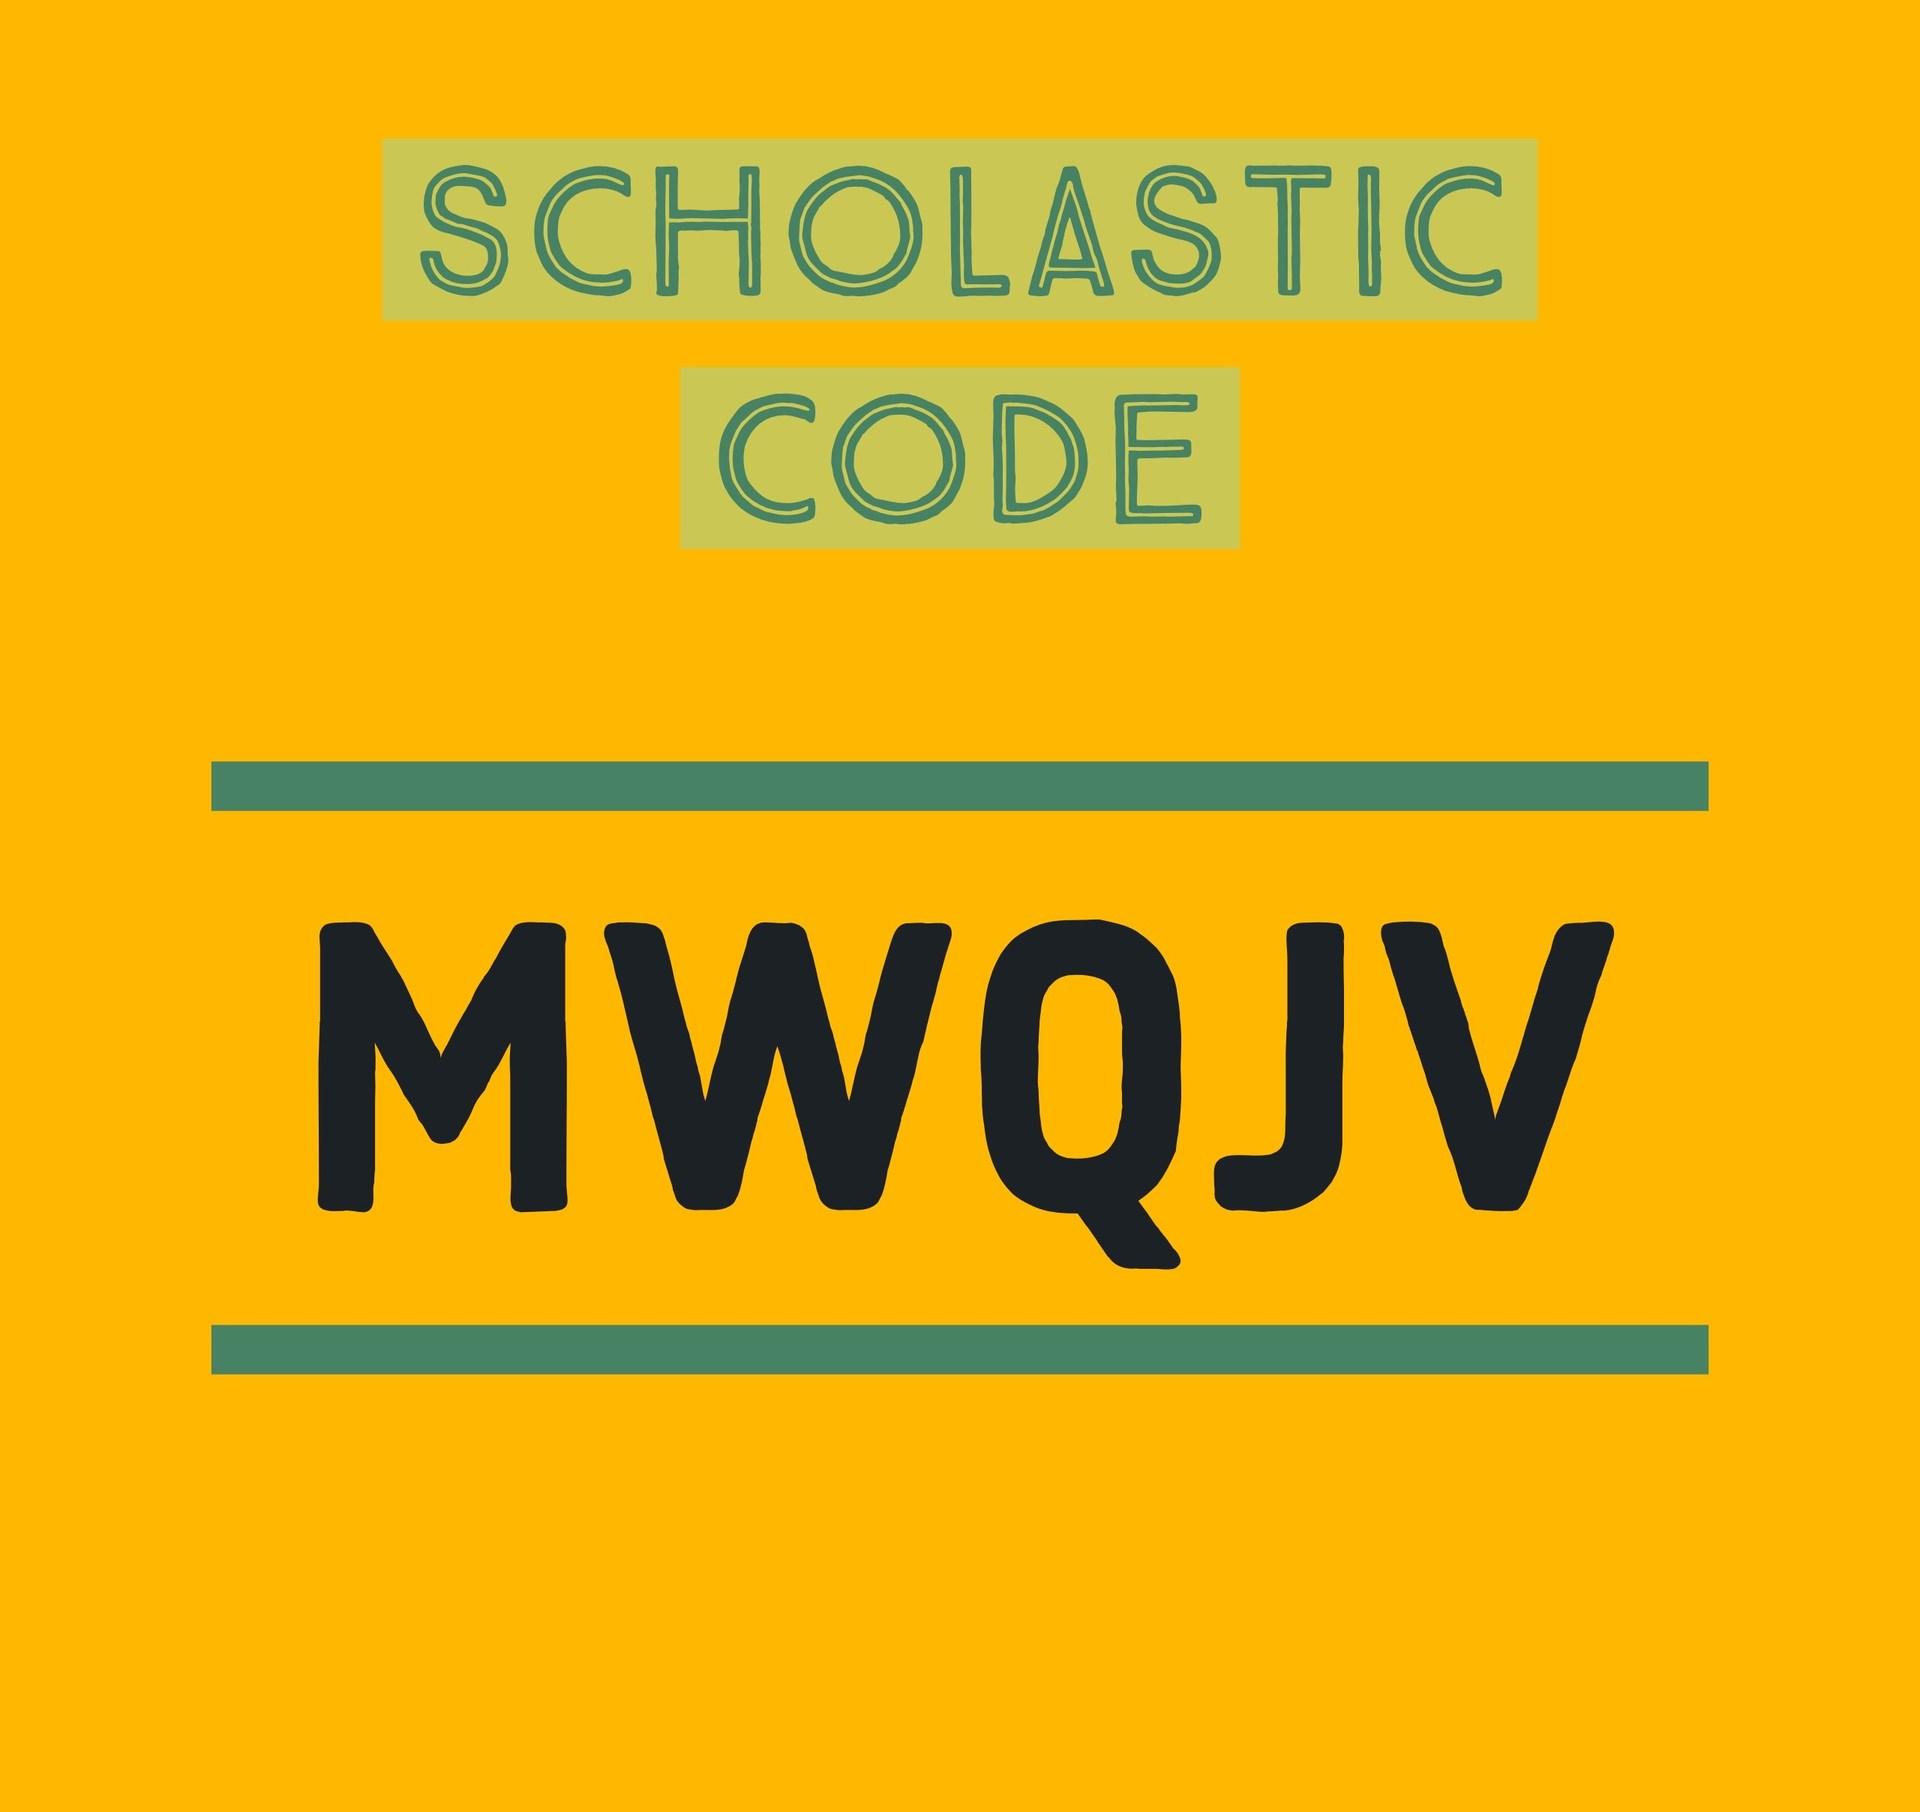 Scholastic Class code